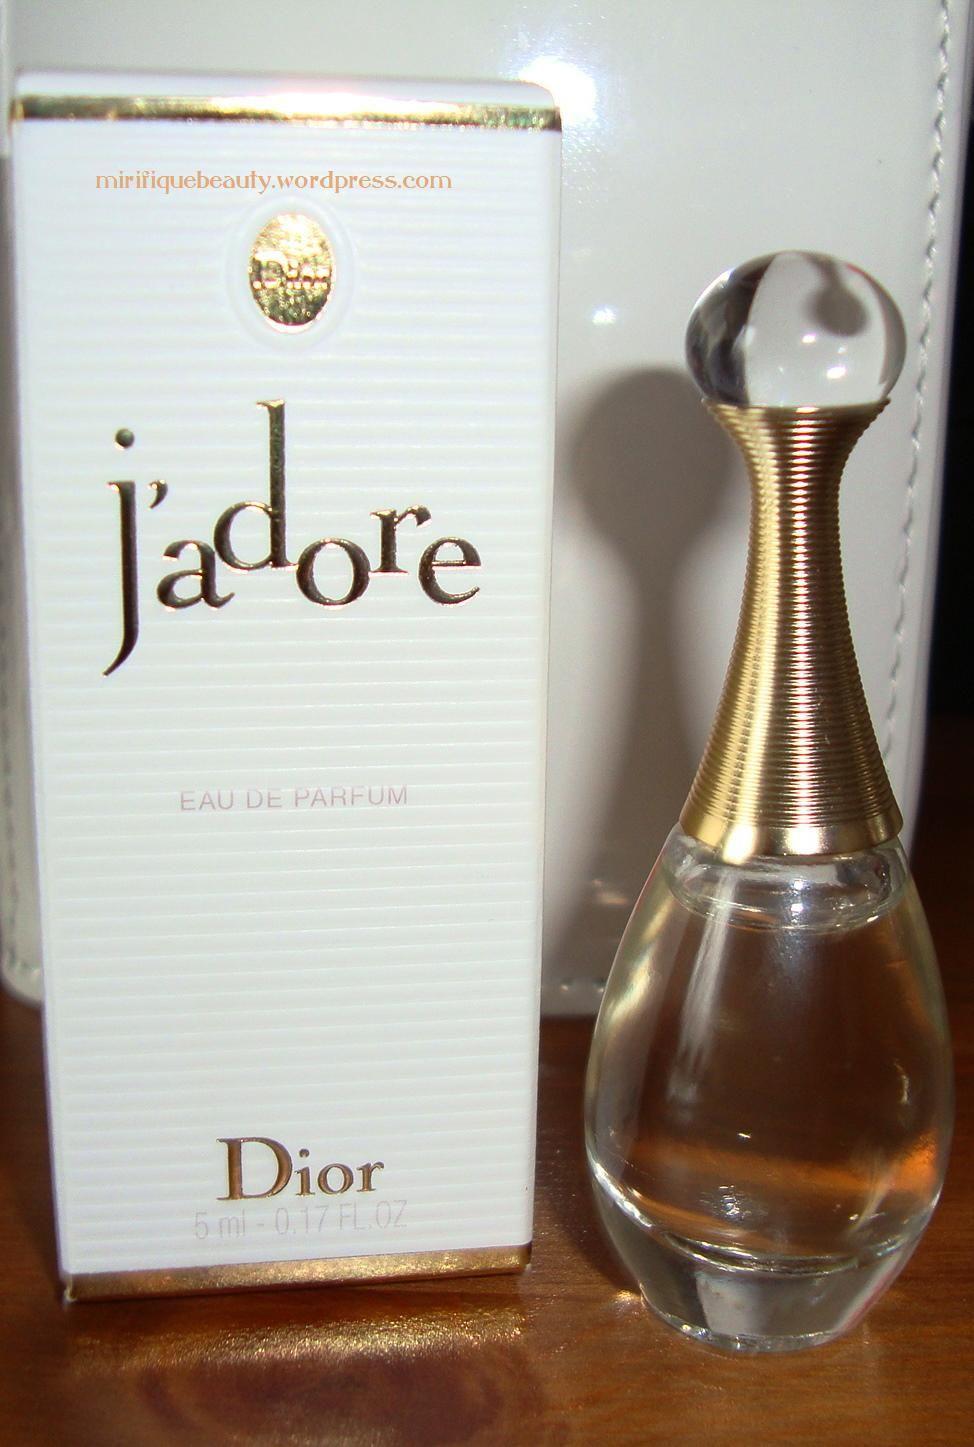 Christian Dior perfume, J'adore